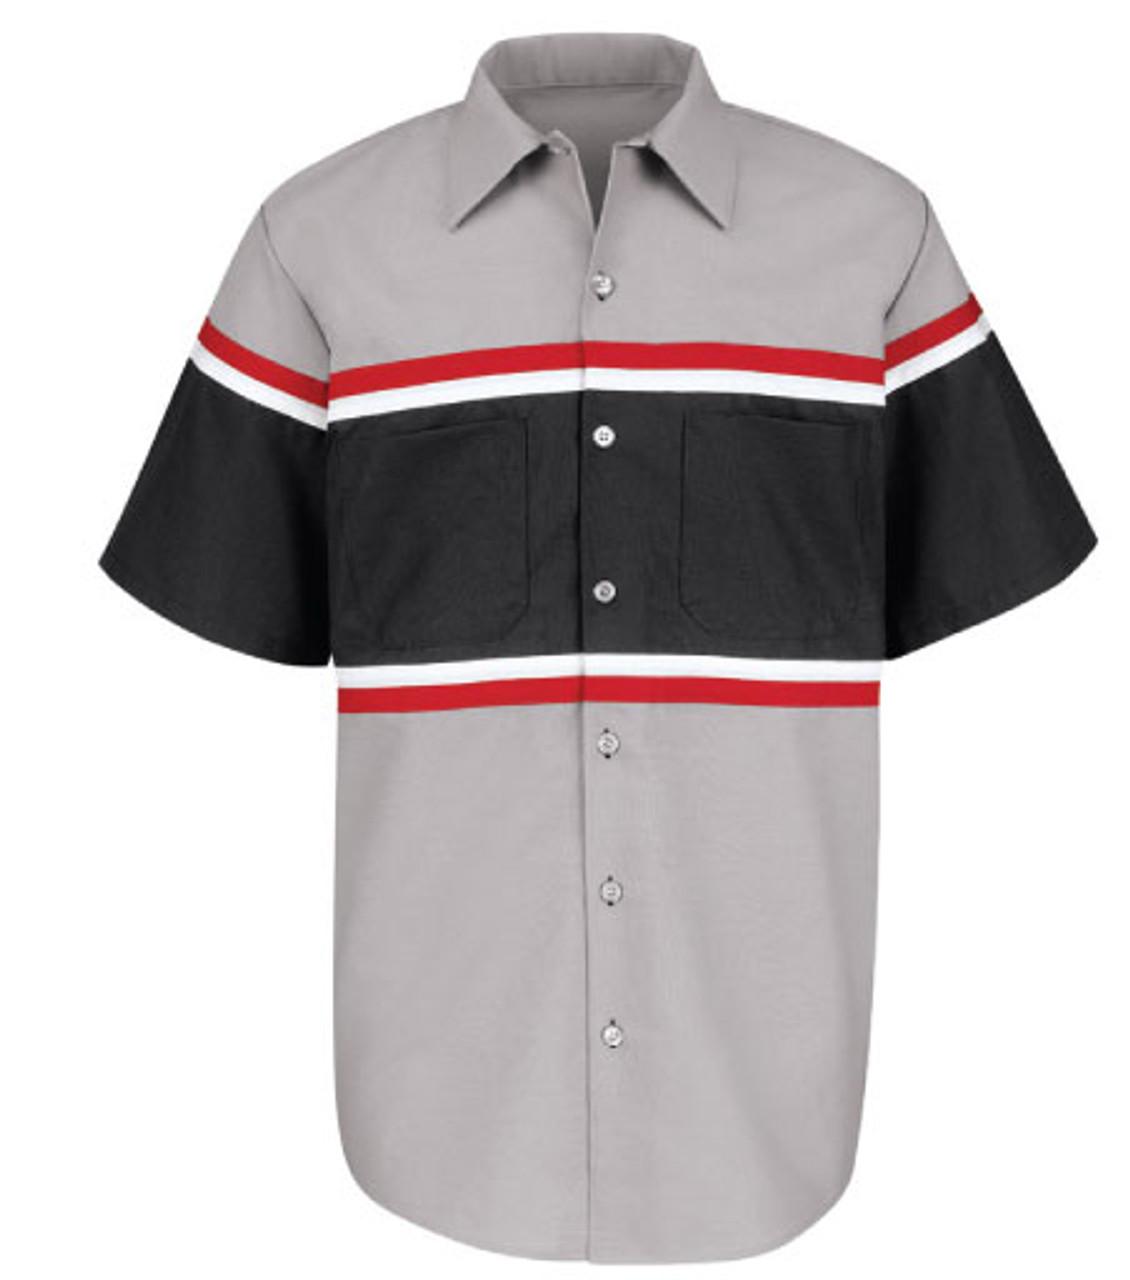 Technician shirt for any auto store